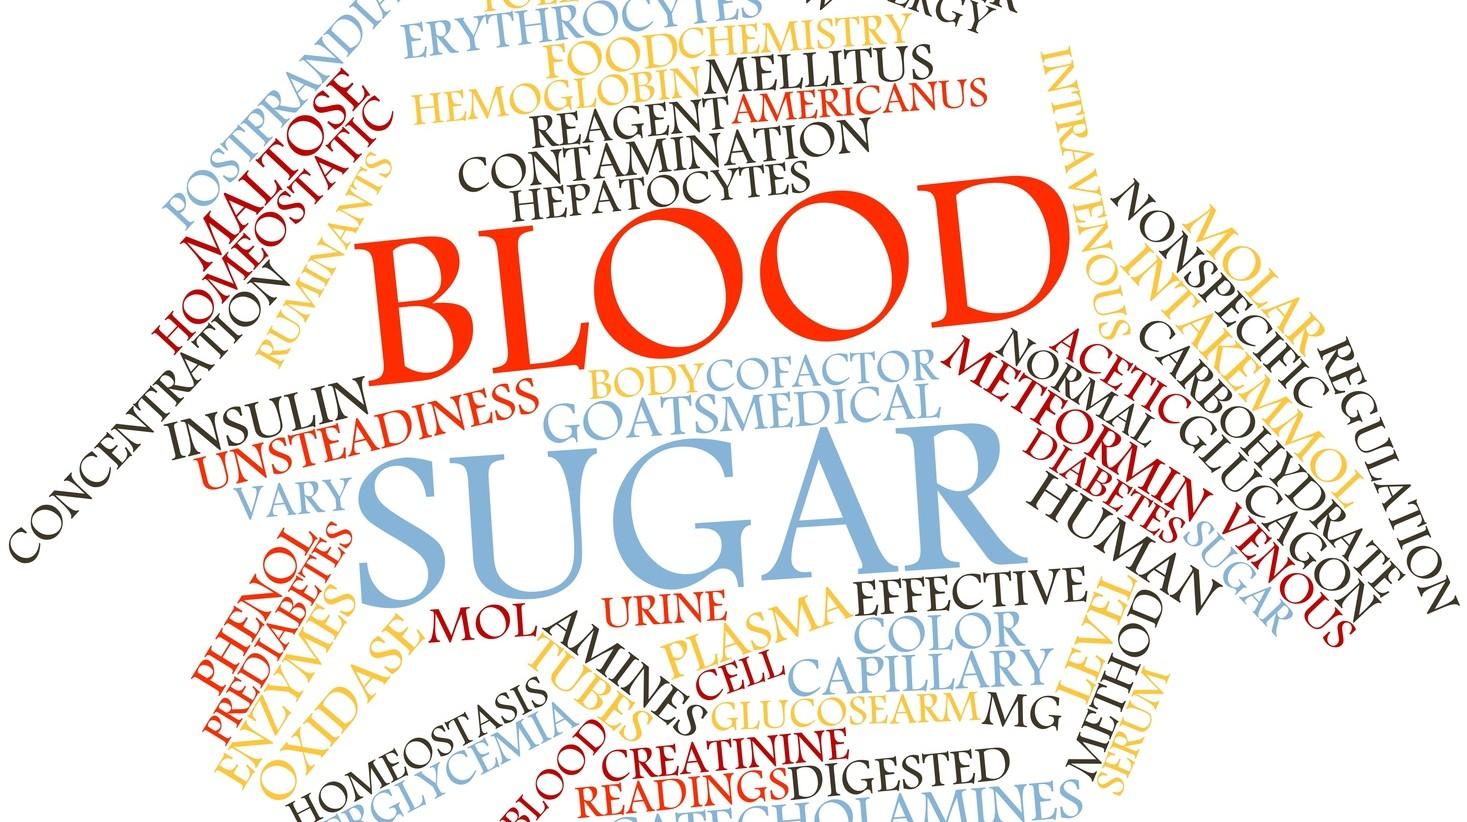 3 Natural Ways to Help Stabilize Blood Sugar